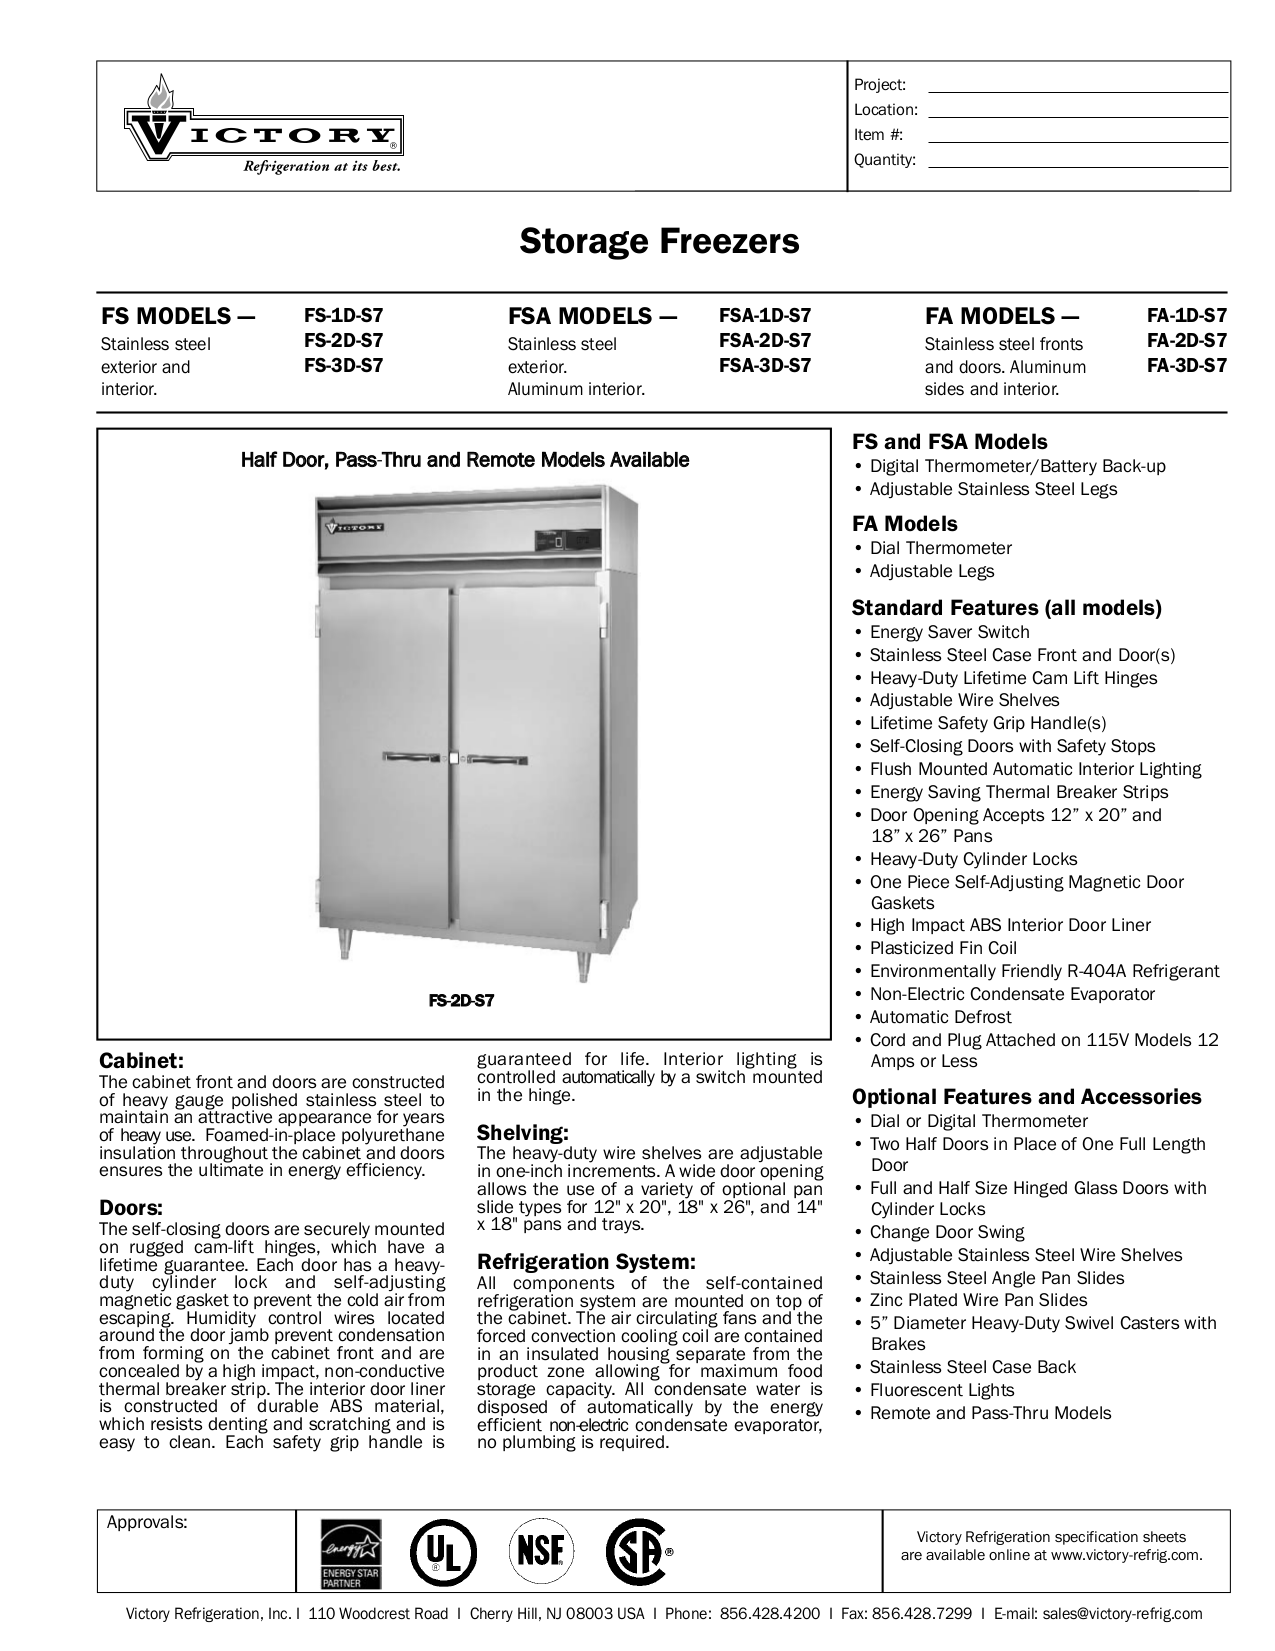 pdf for Victory Freezer FSA-1D-S7 manual